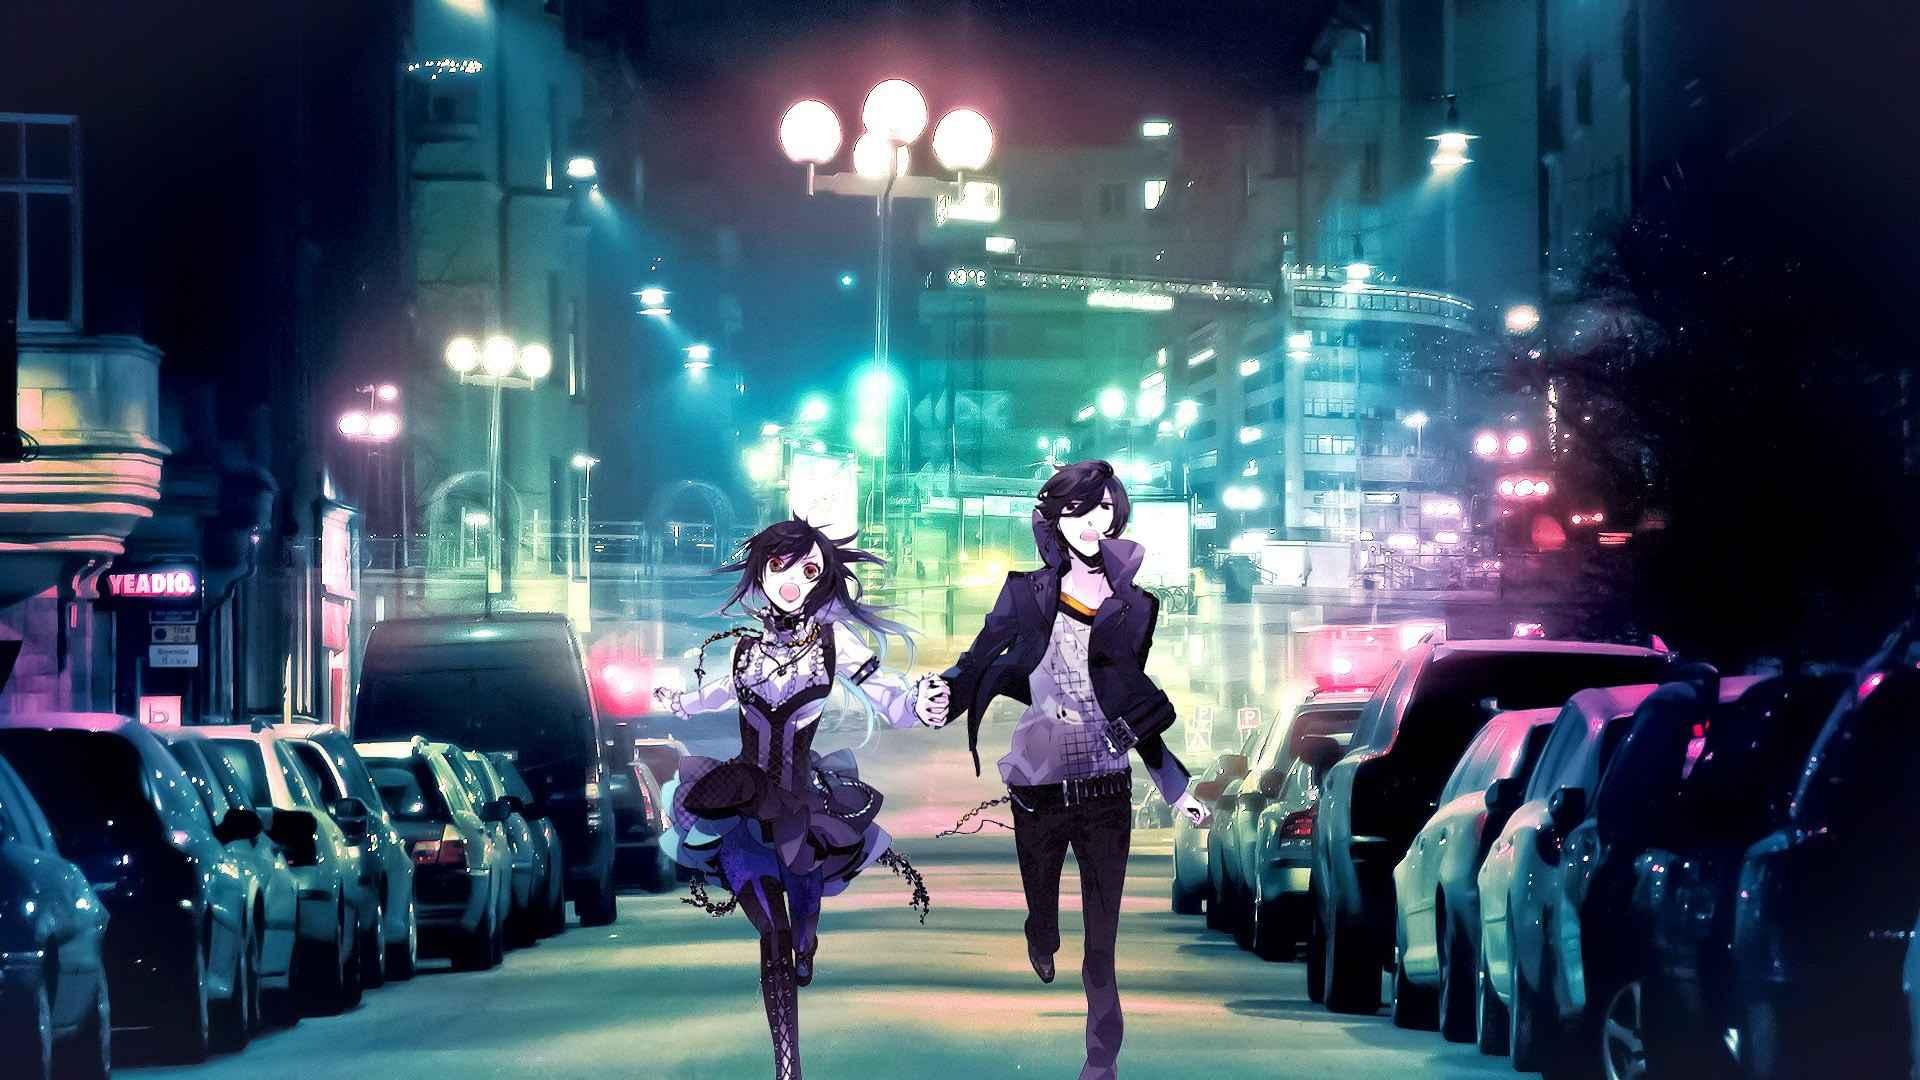 Couple in love anime wallpaper